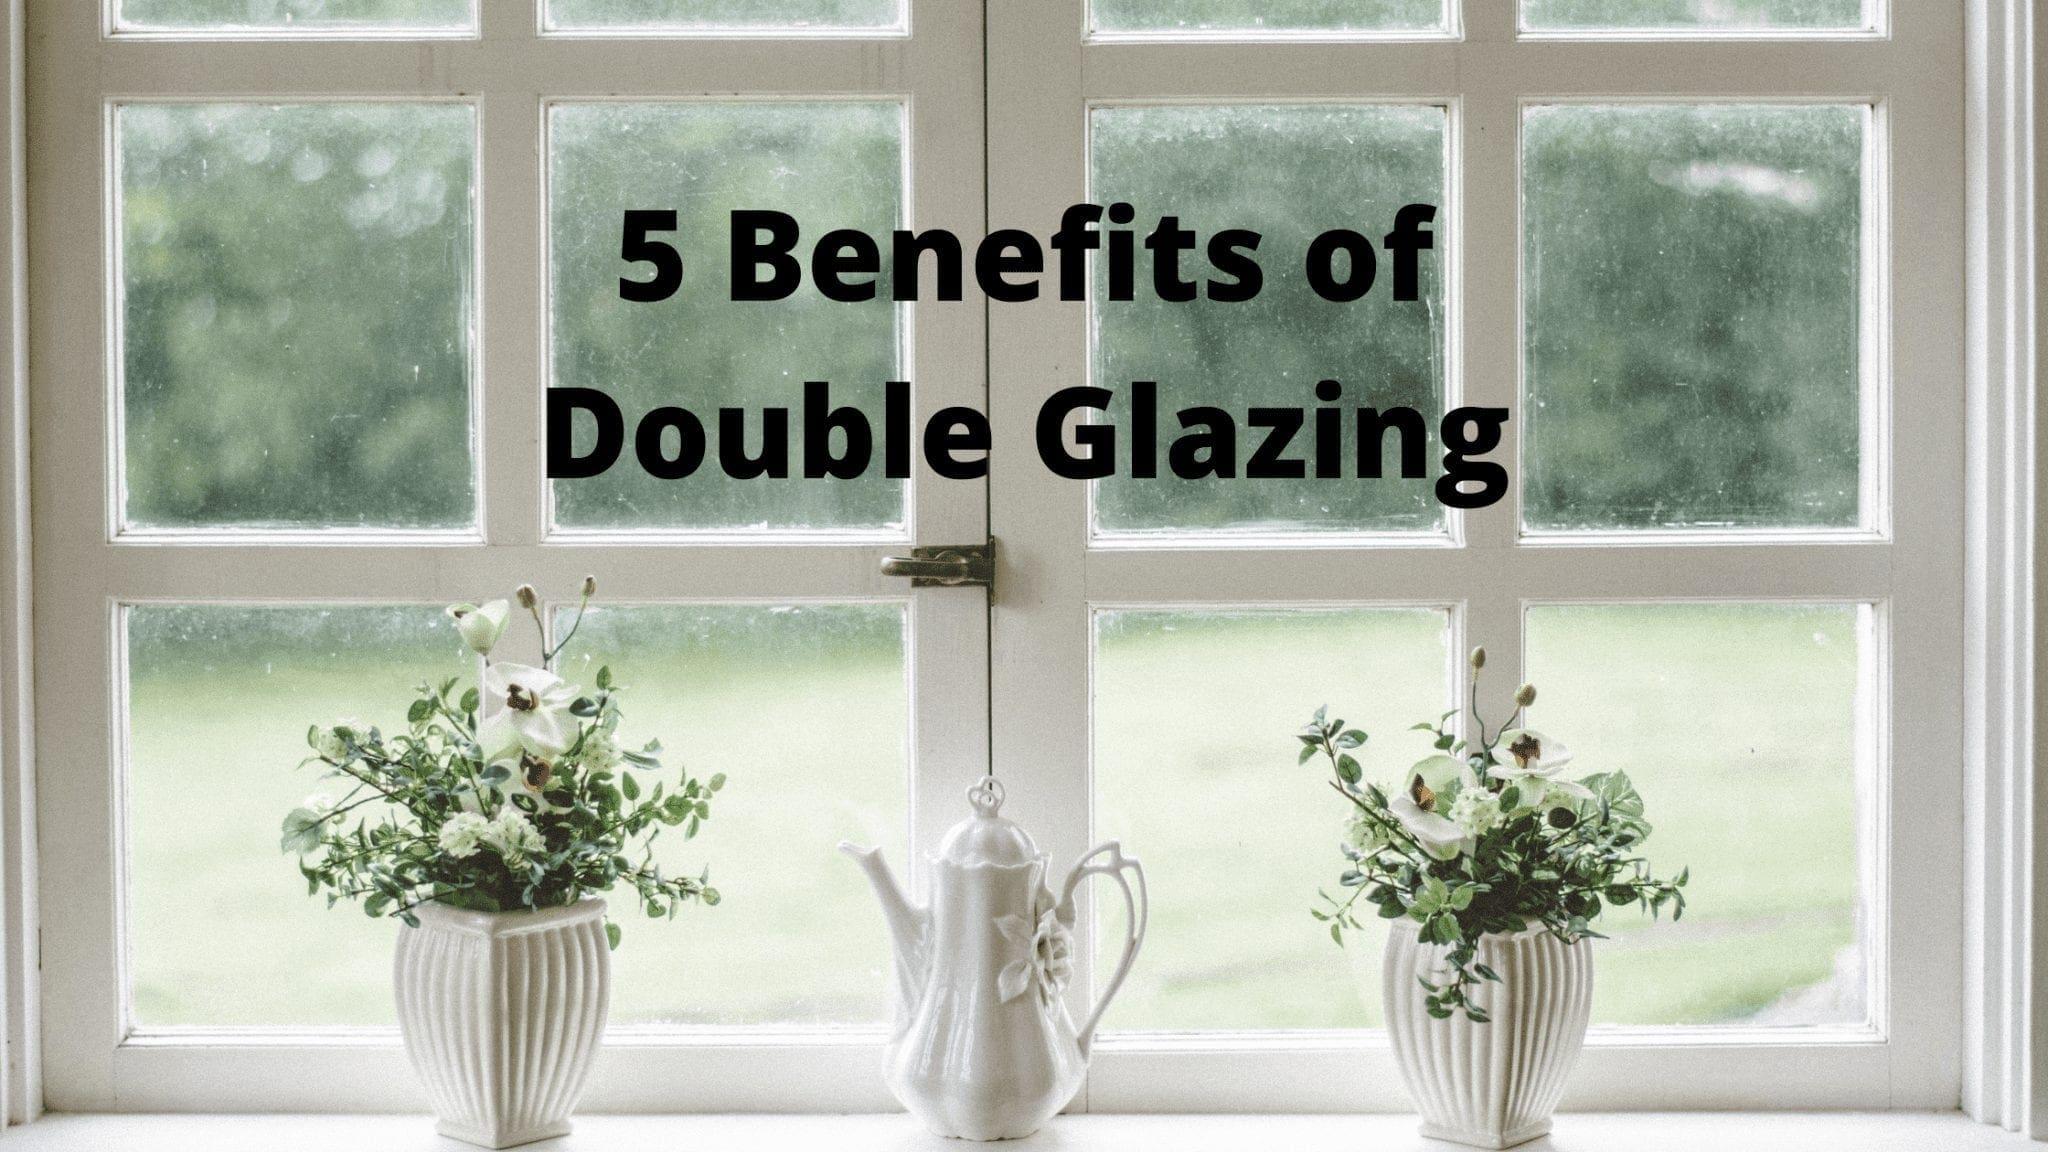 5 Benefits of Double Glazing